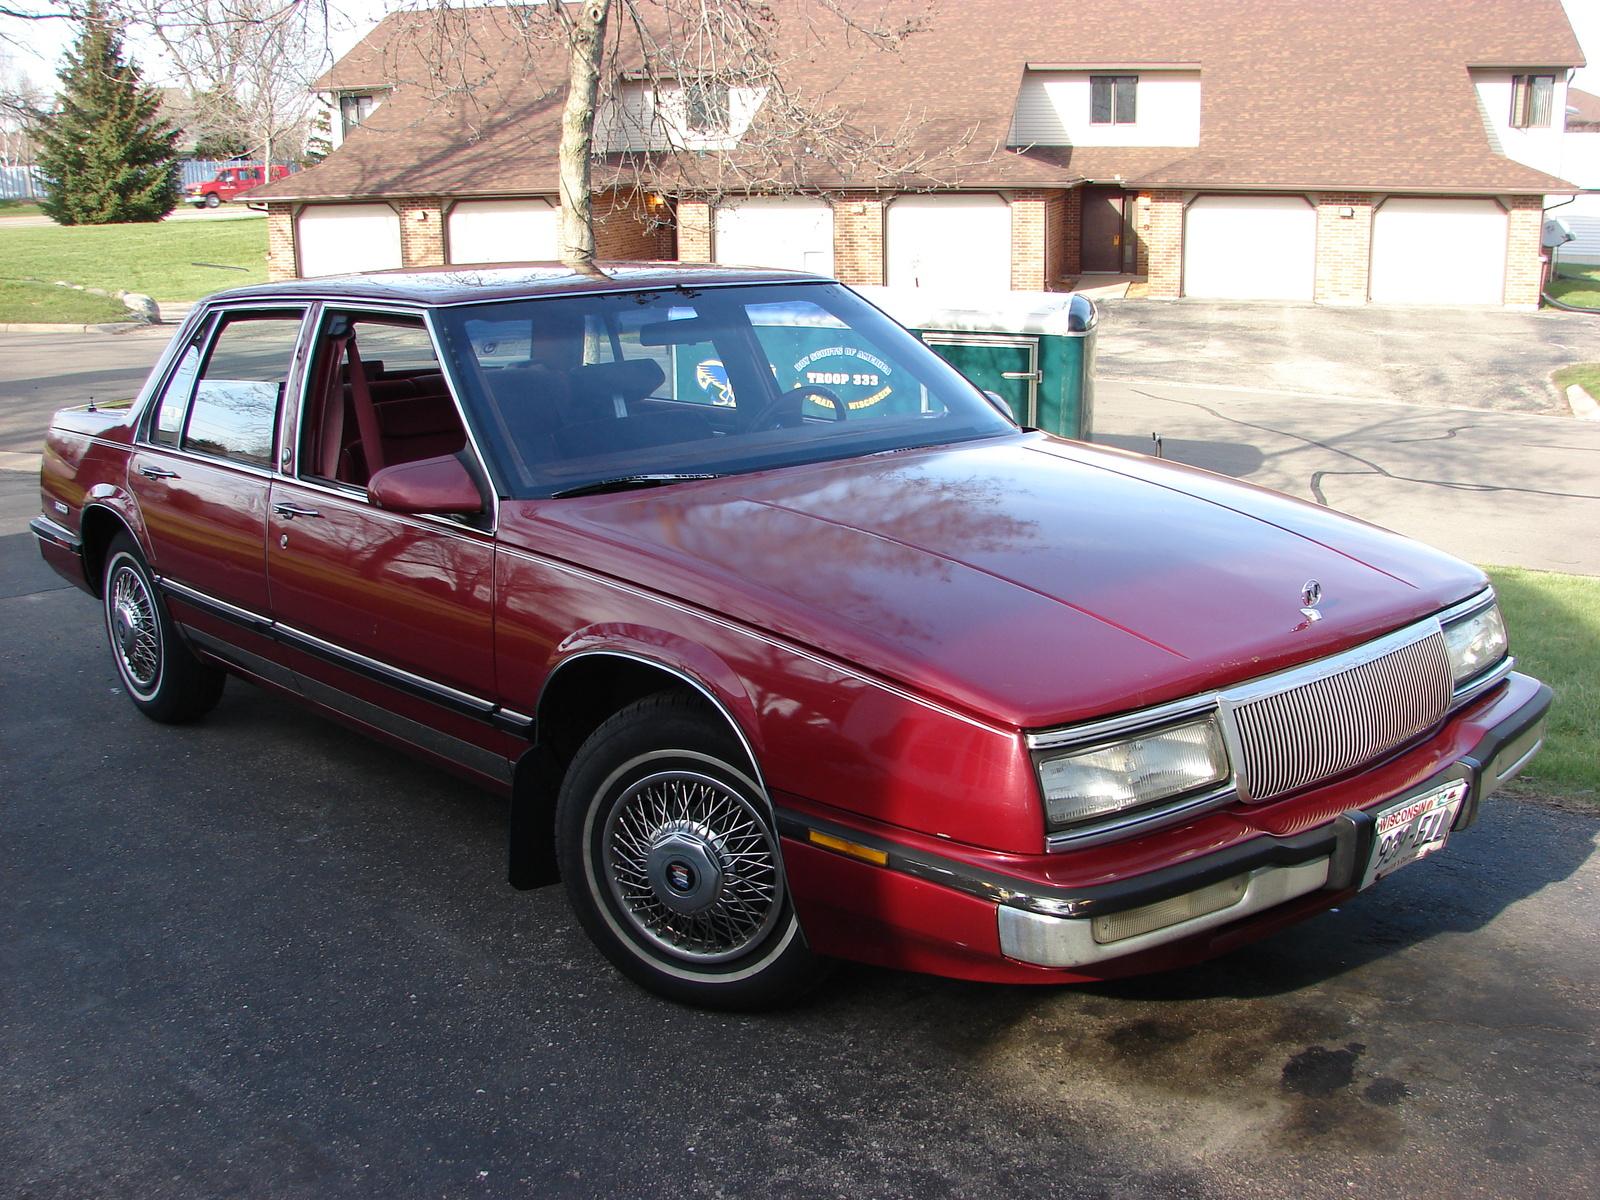 1990 Buick LeSabre Custom Sedan, 1990 Buick LeSabre Buick LeSabre 4dr ...